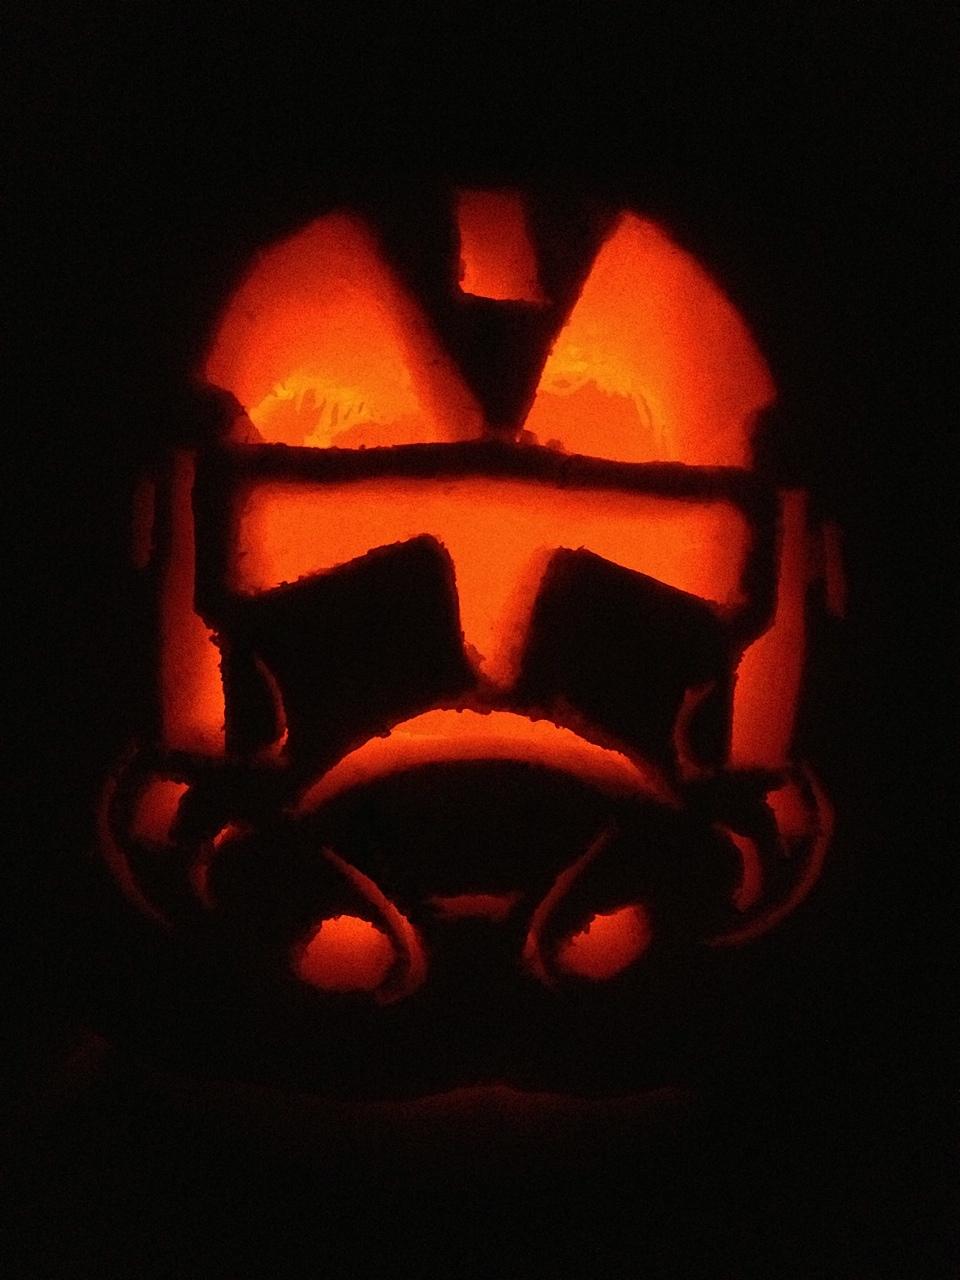 My Little Pony, Star Wars, Jack Skellington Pumpkins & Caramel ...